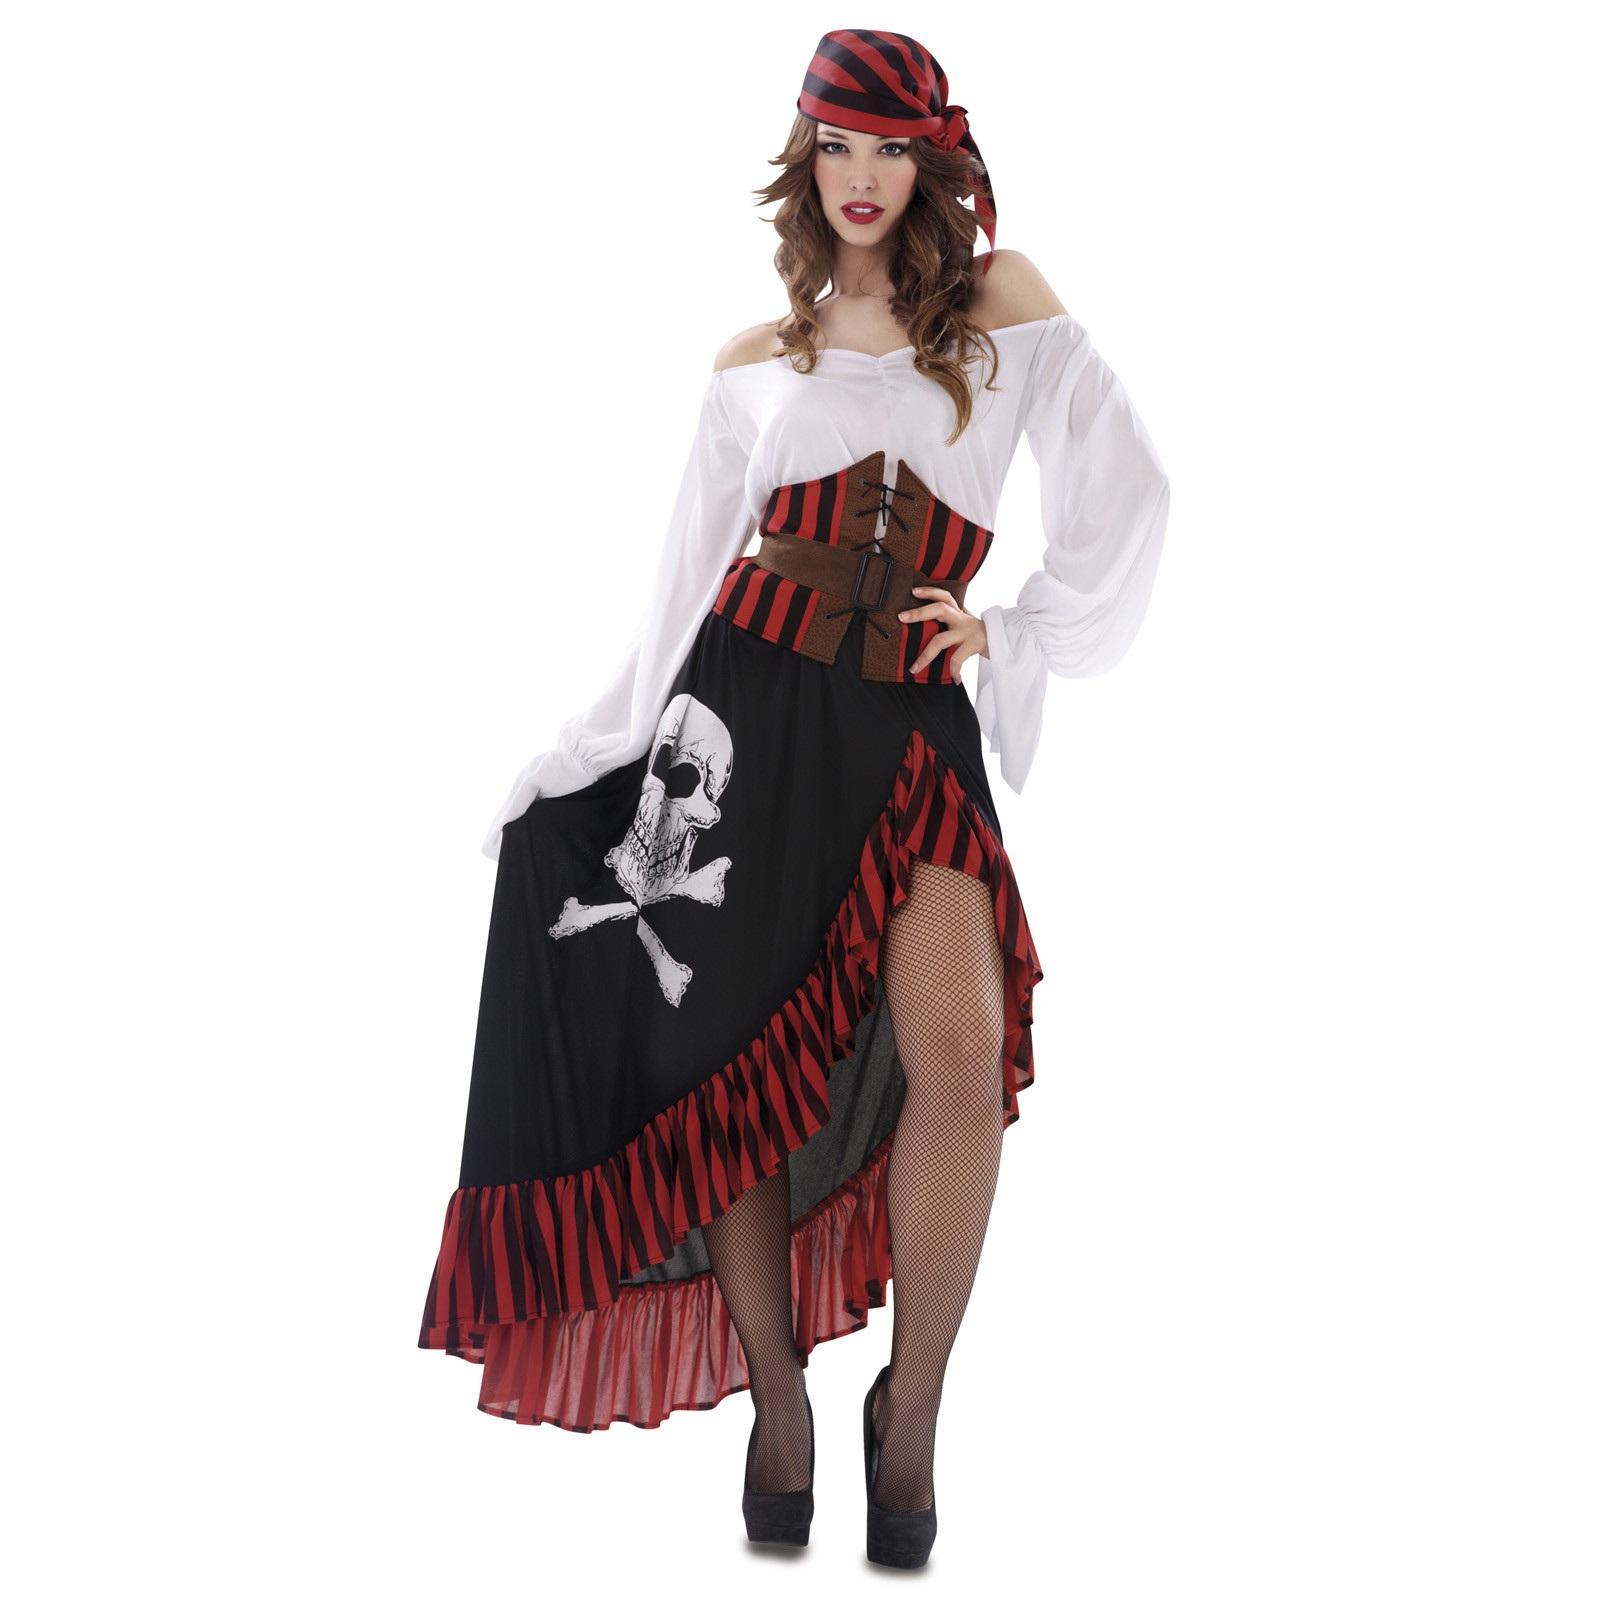 disfraz pirata bandana mujer 200626mom - DISFRAZ DE PIRATA BANDANA MUJER